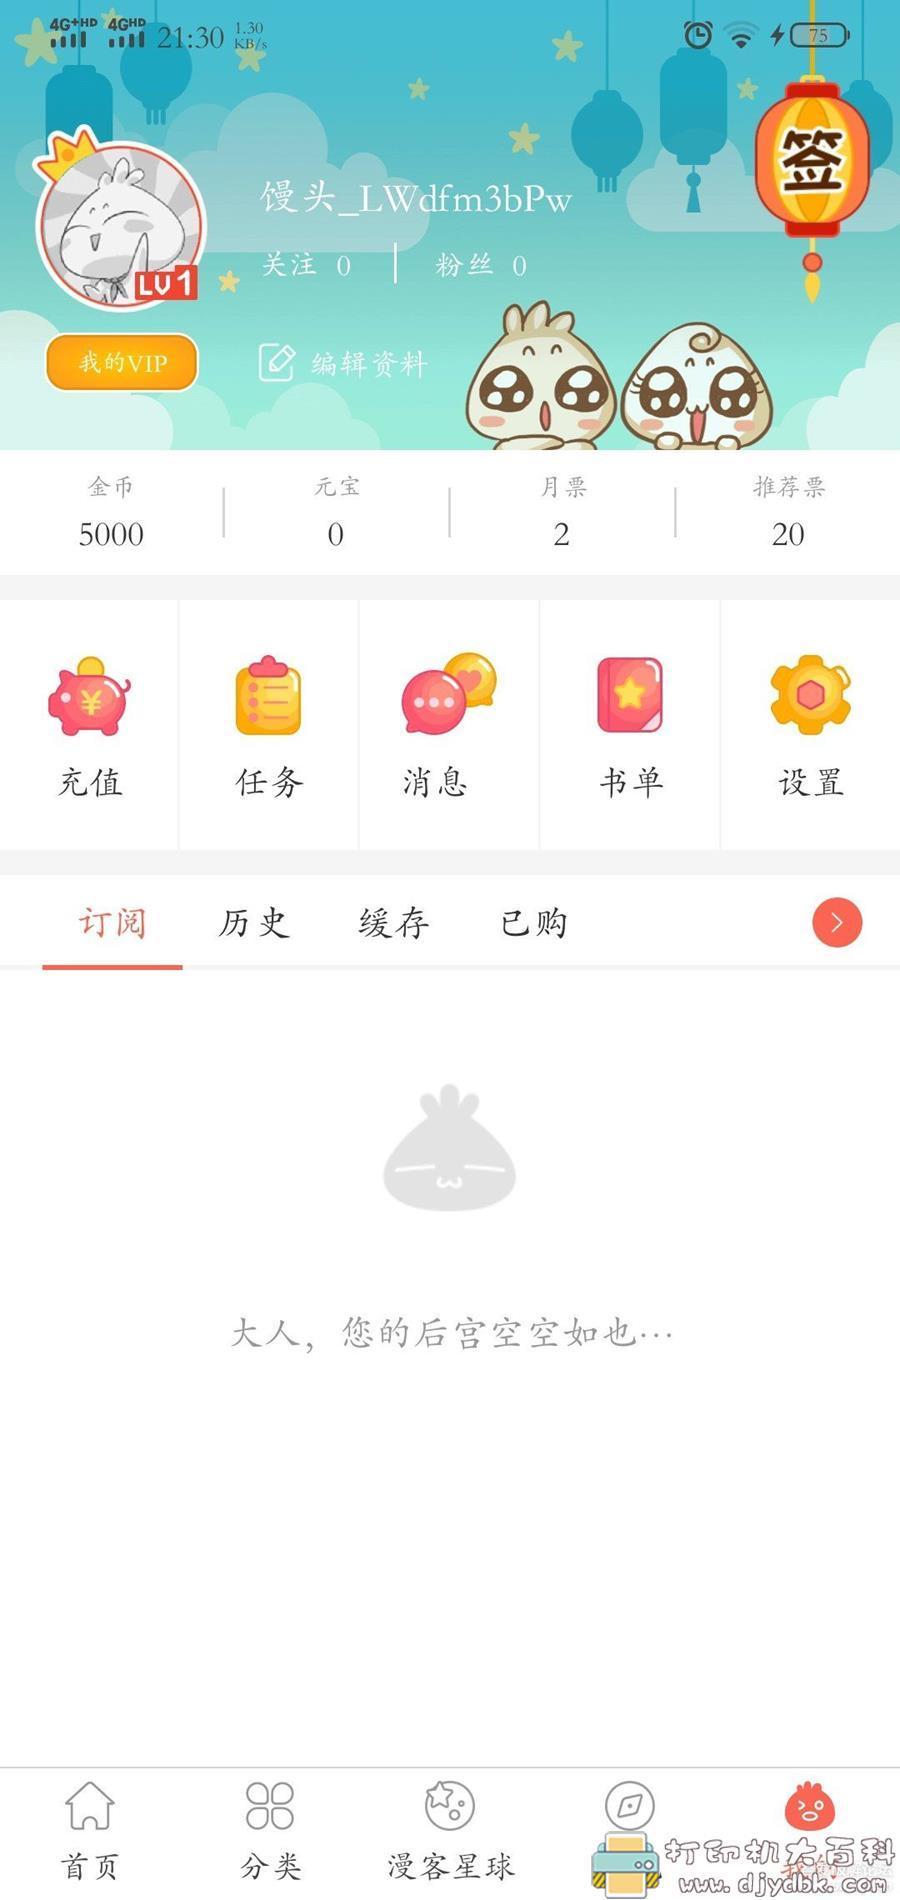 [Android]知音漫客破解版随意看图片 No.1